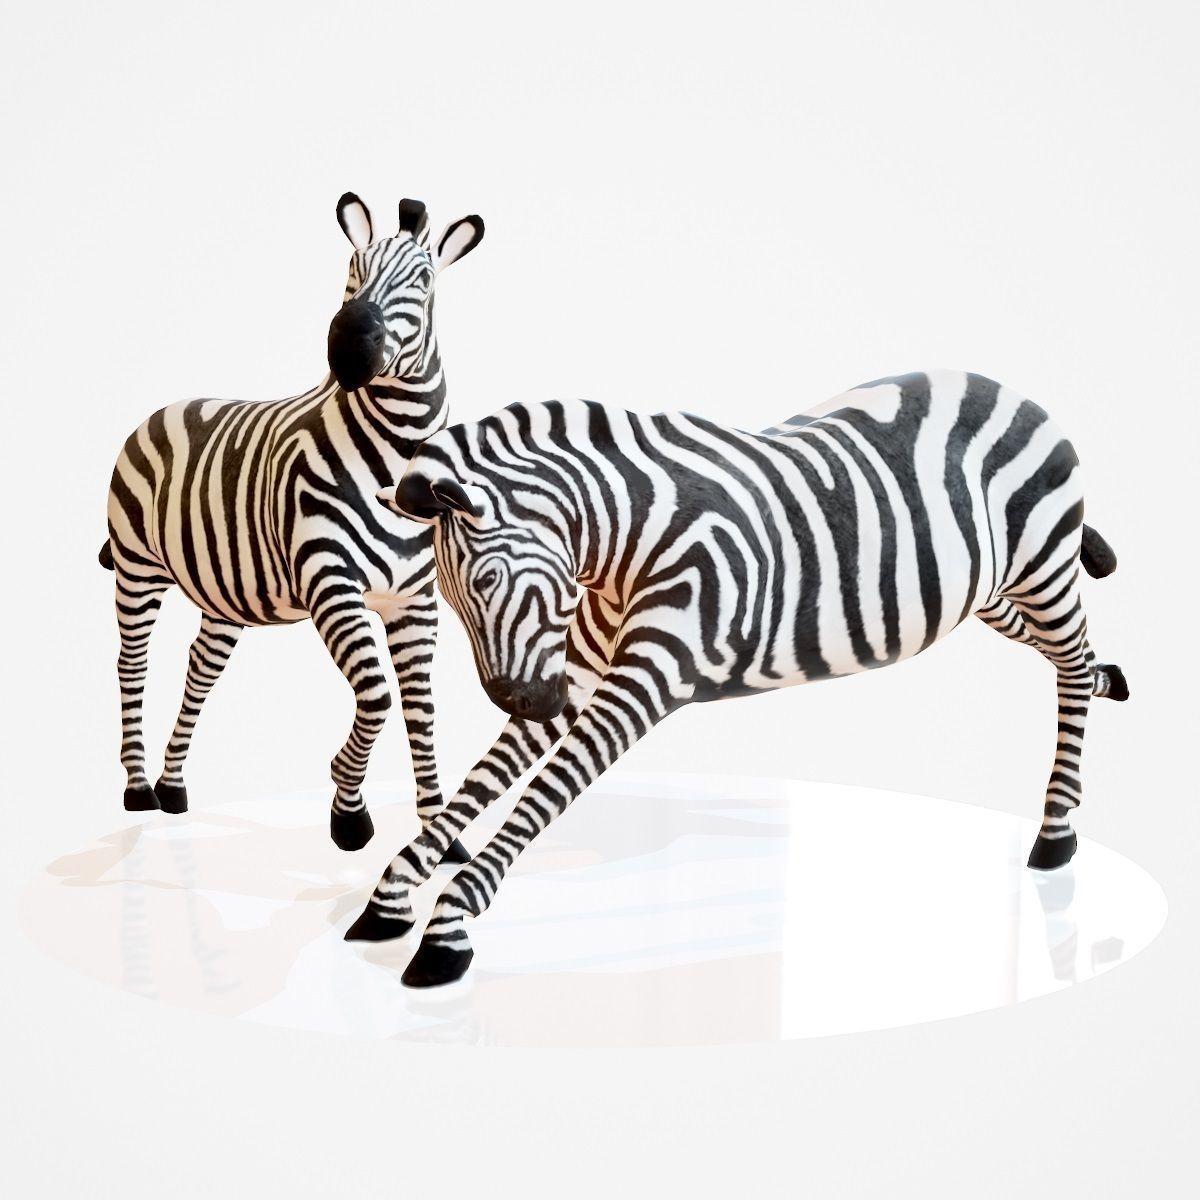 Zebra Rigged 3d Model Zebra 3d Model Animals